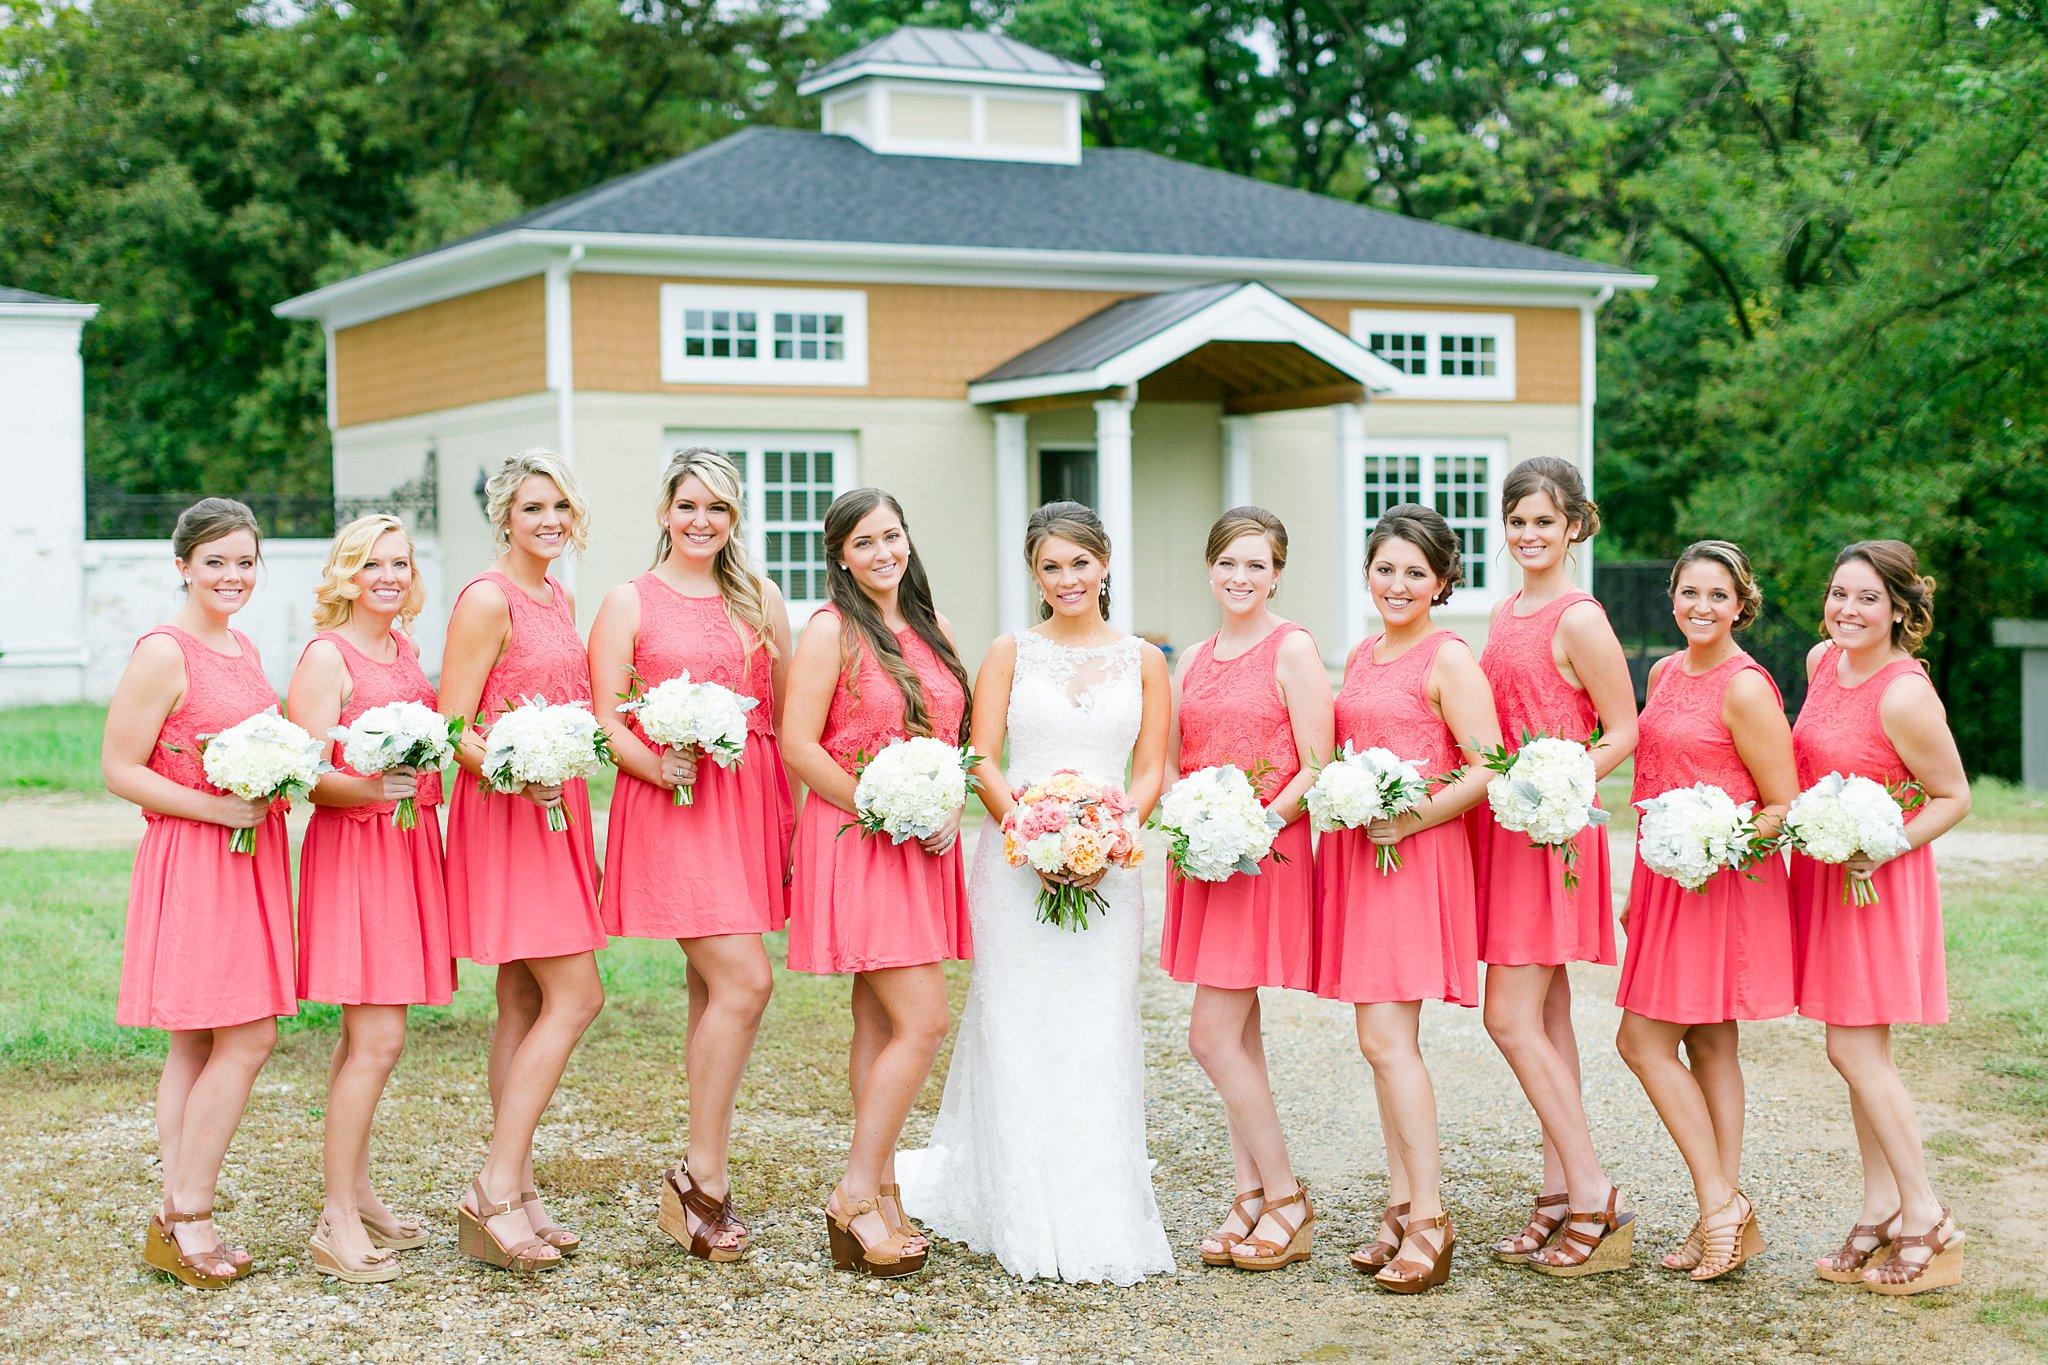 Stone Tower Winery Wedding Photos Virginia Wedding Photographer Megan Kelsey Photography Sam & Angela-54.jpg